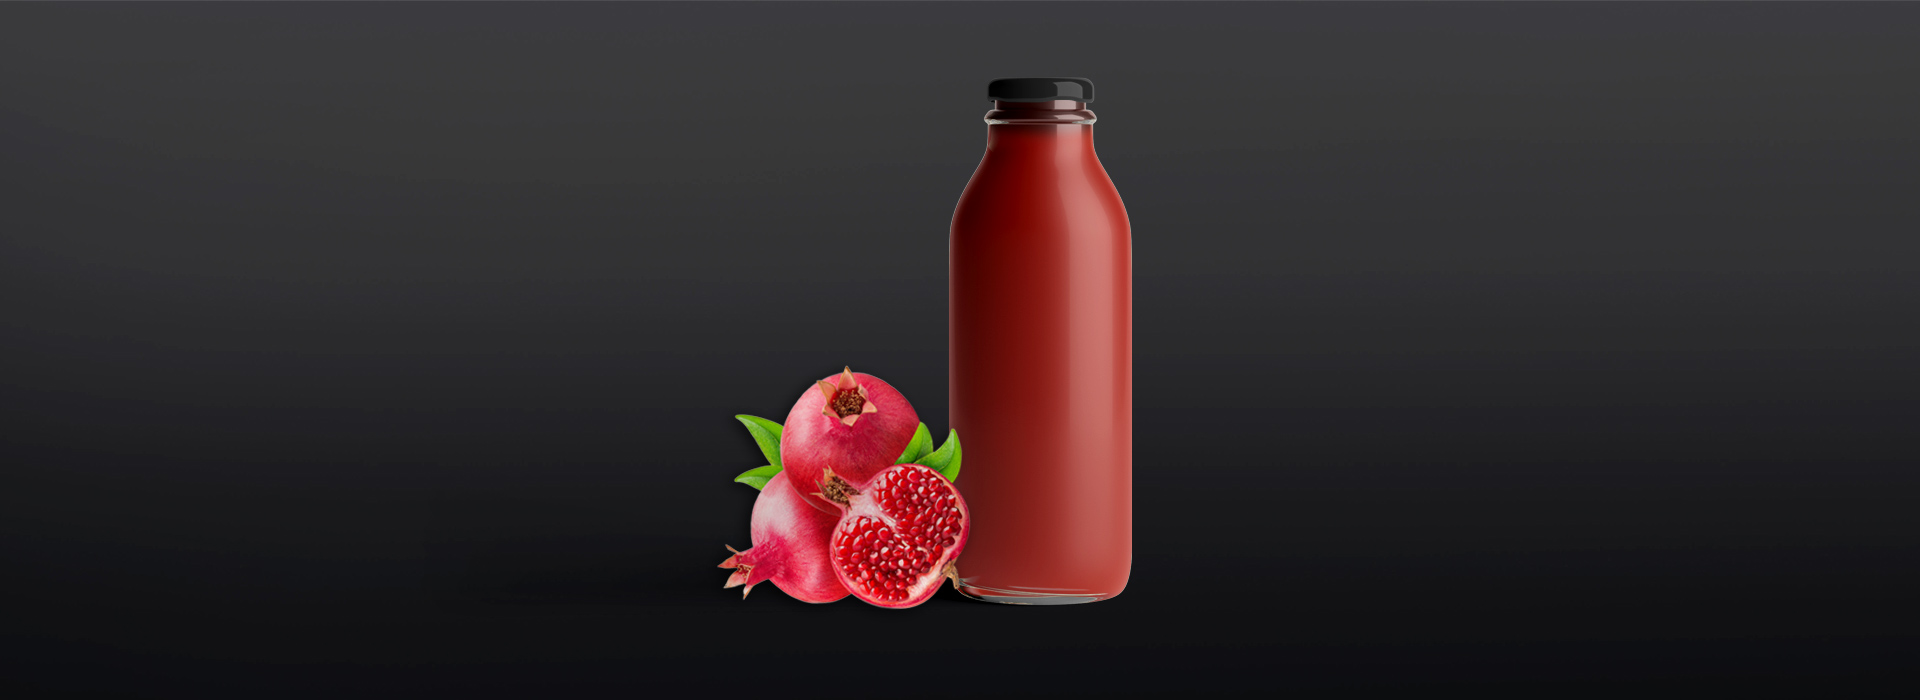 sraml-pomegranate-juice